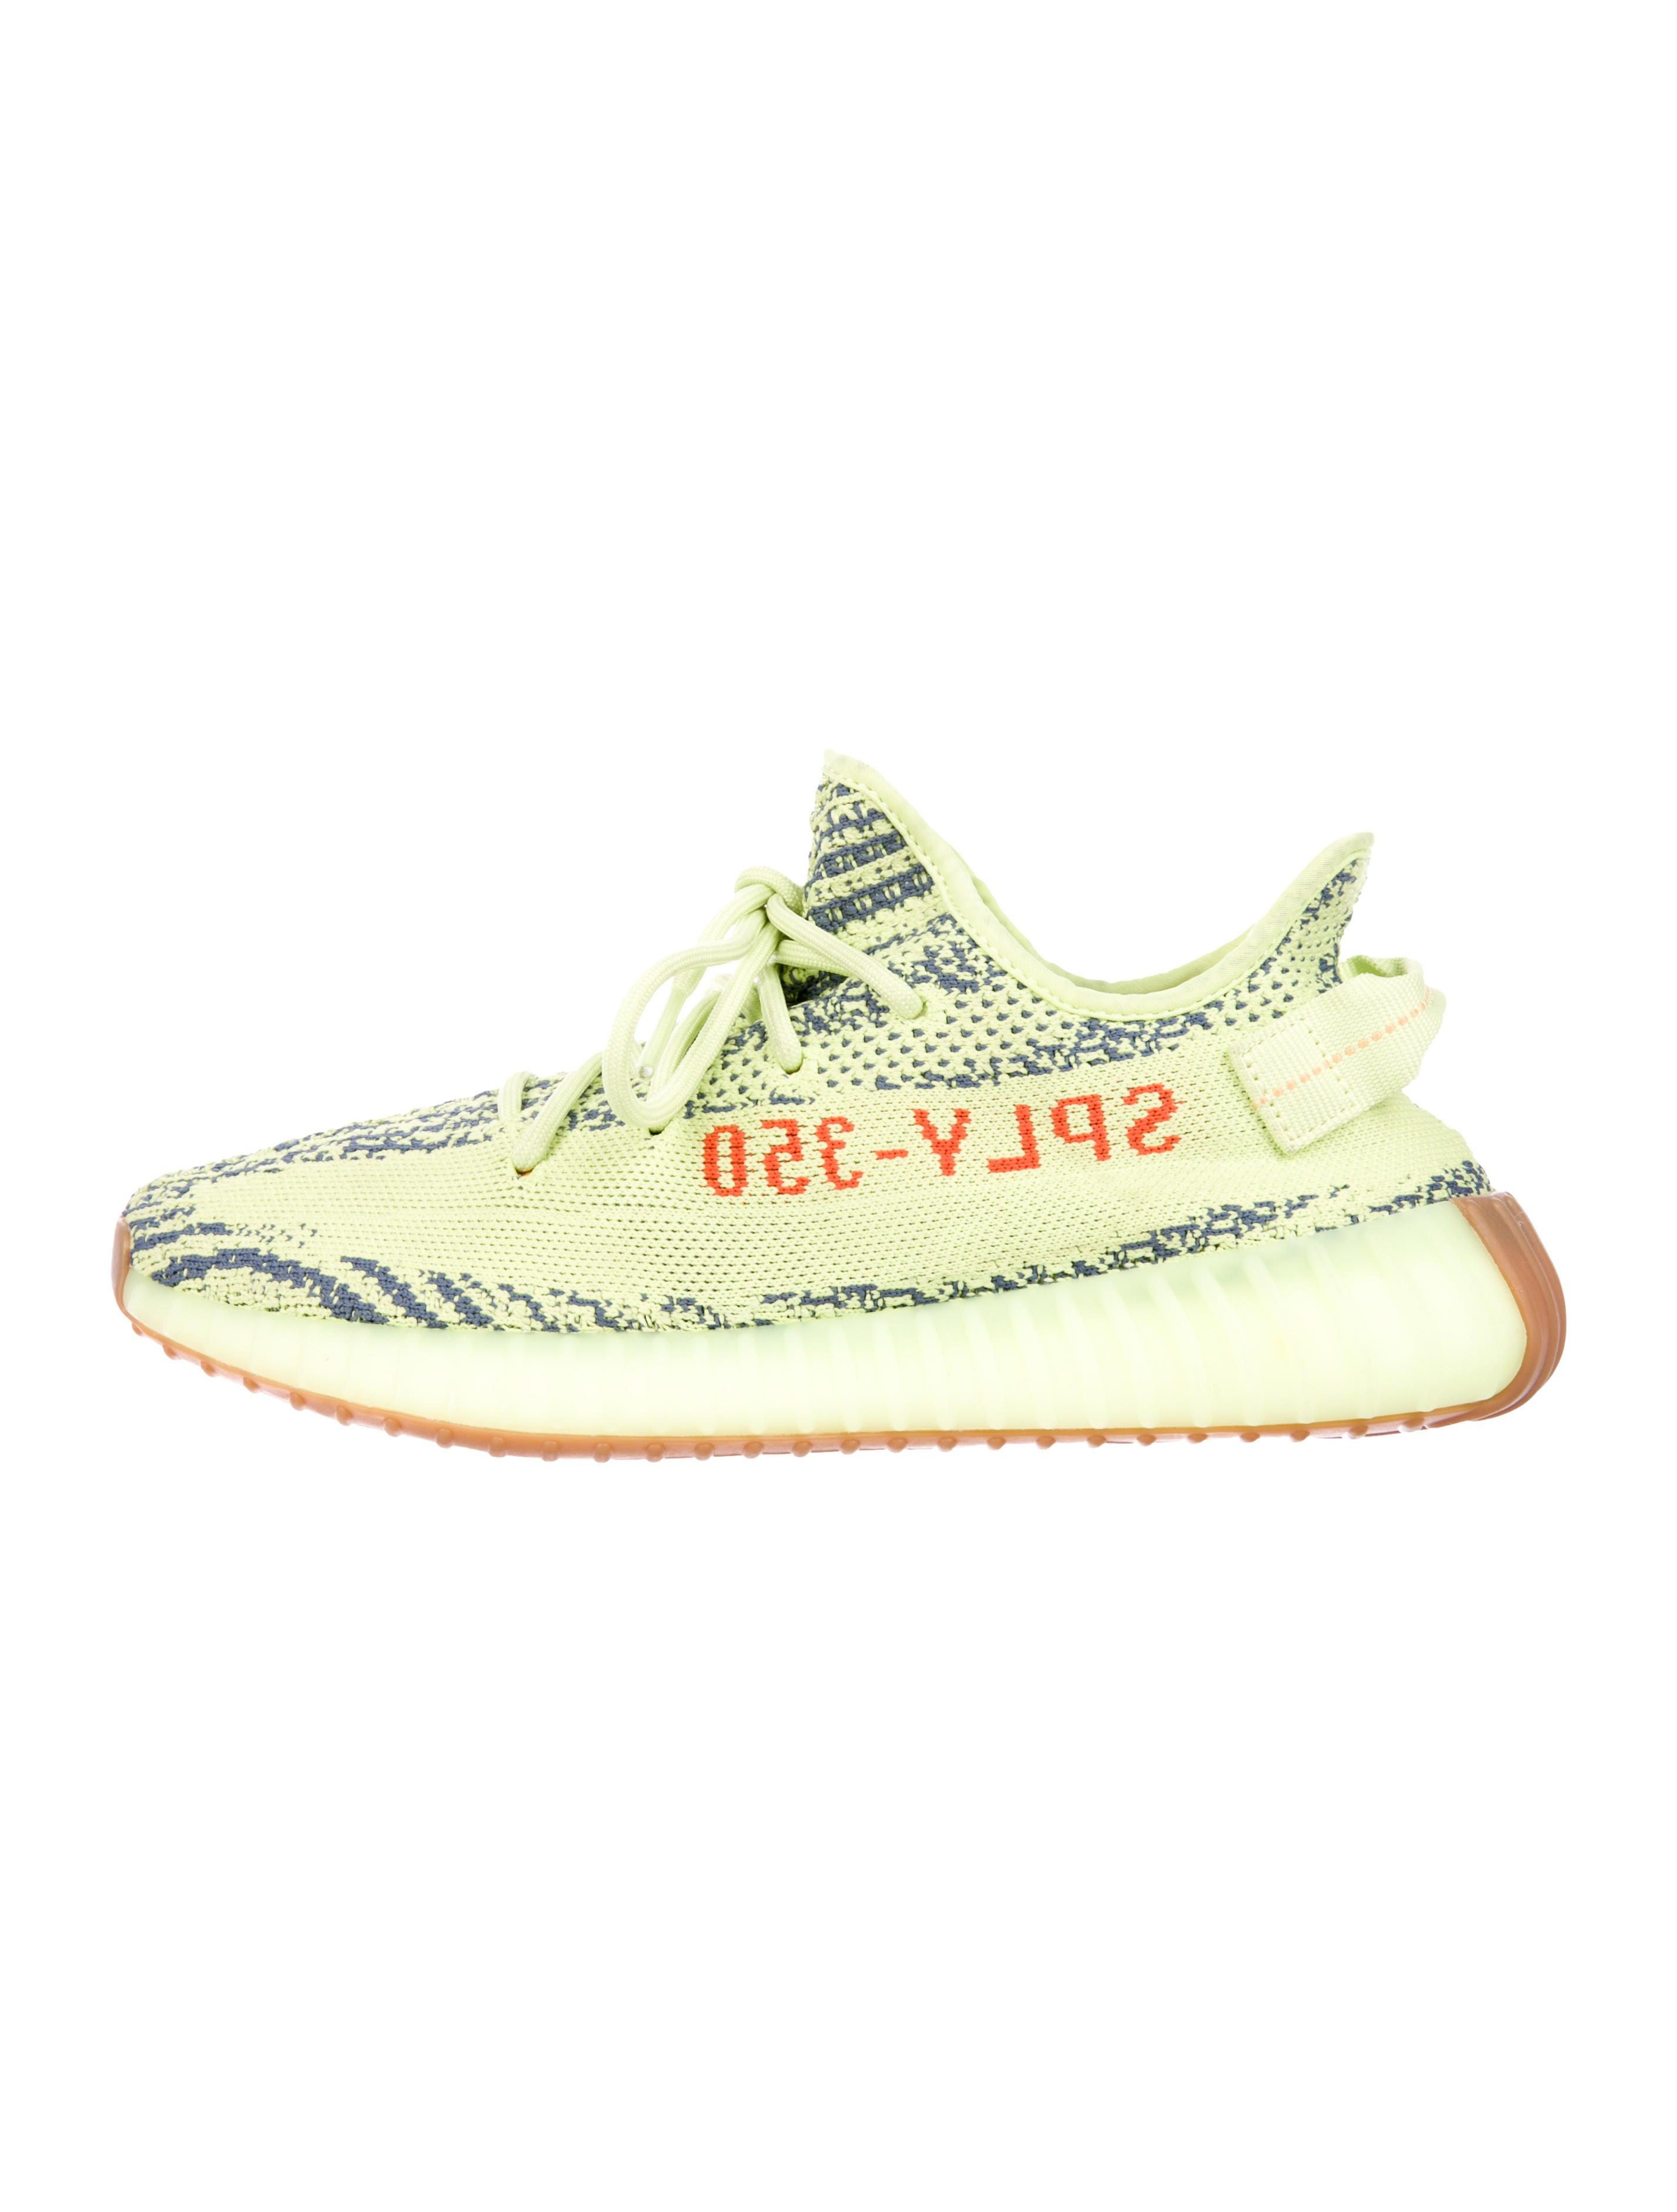 buy popular 0988d d563d 2018 Semi Frozen Yellow Boost 350 V2